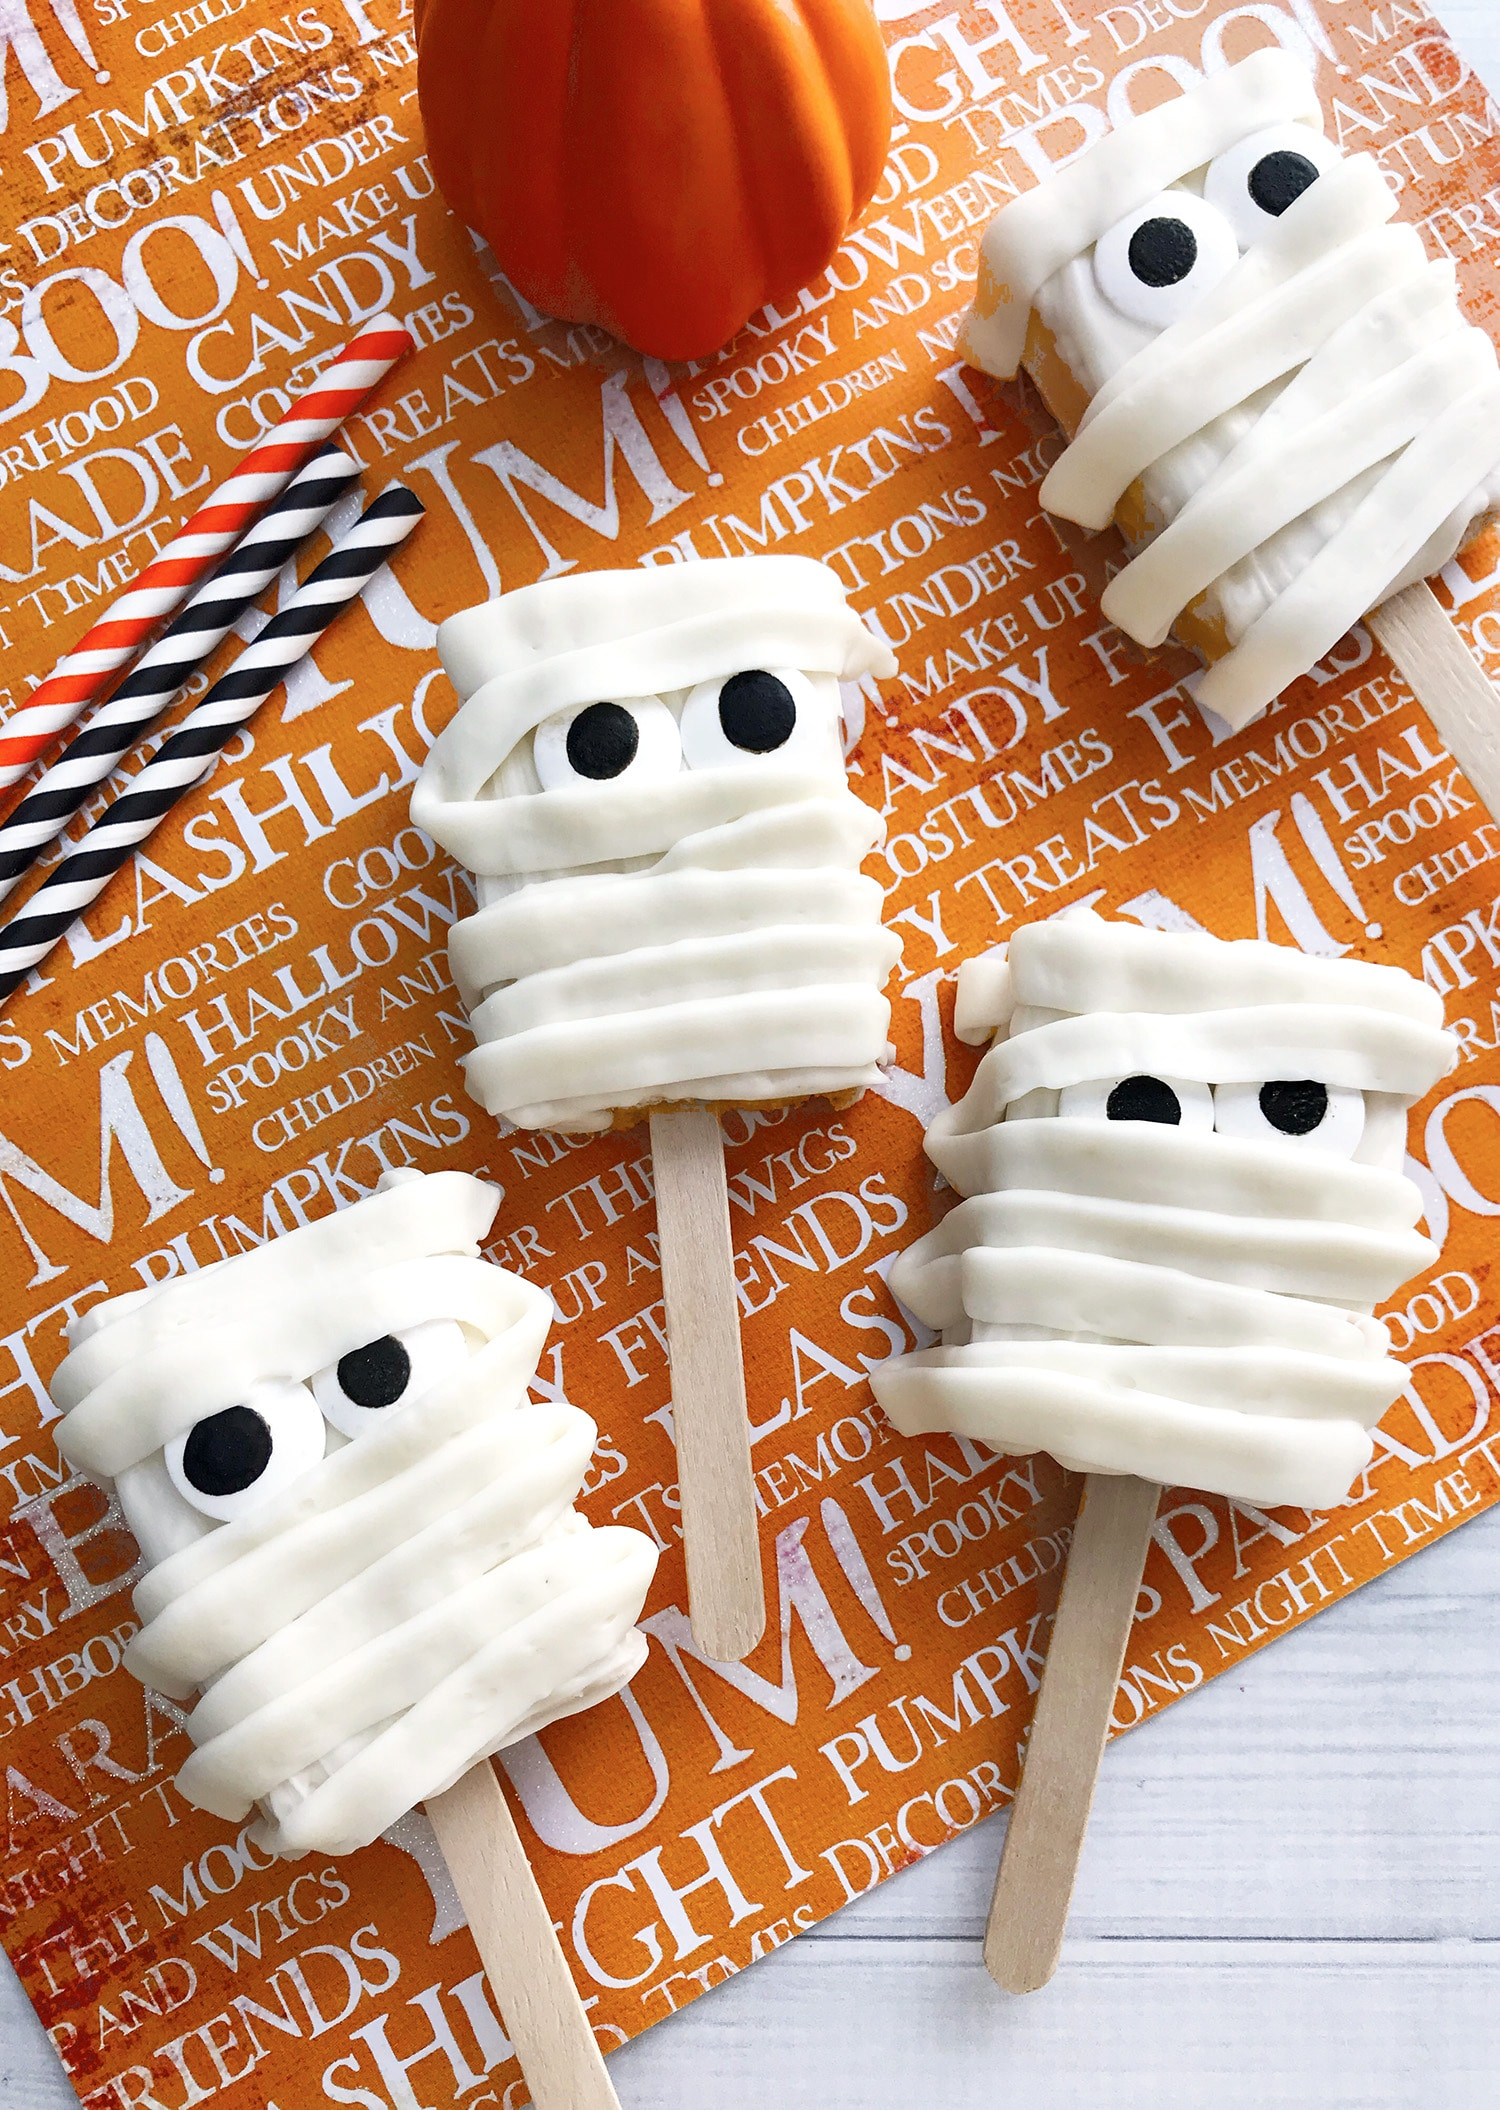 Mummy Rice Krispies Treats on an orange Halloween background